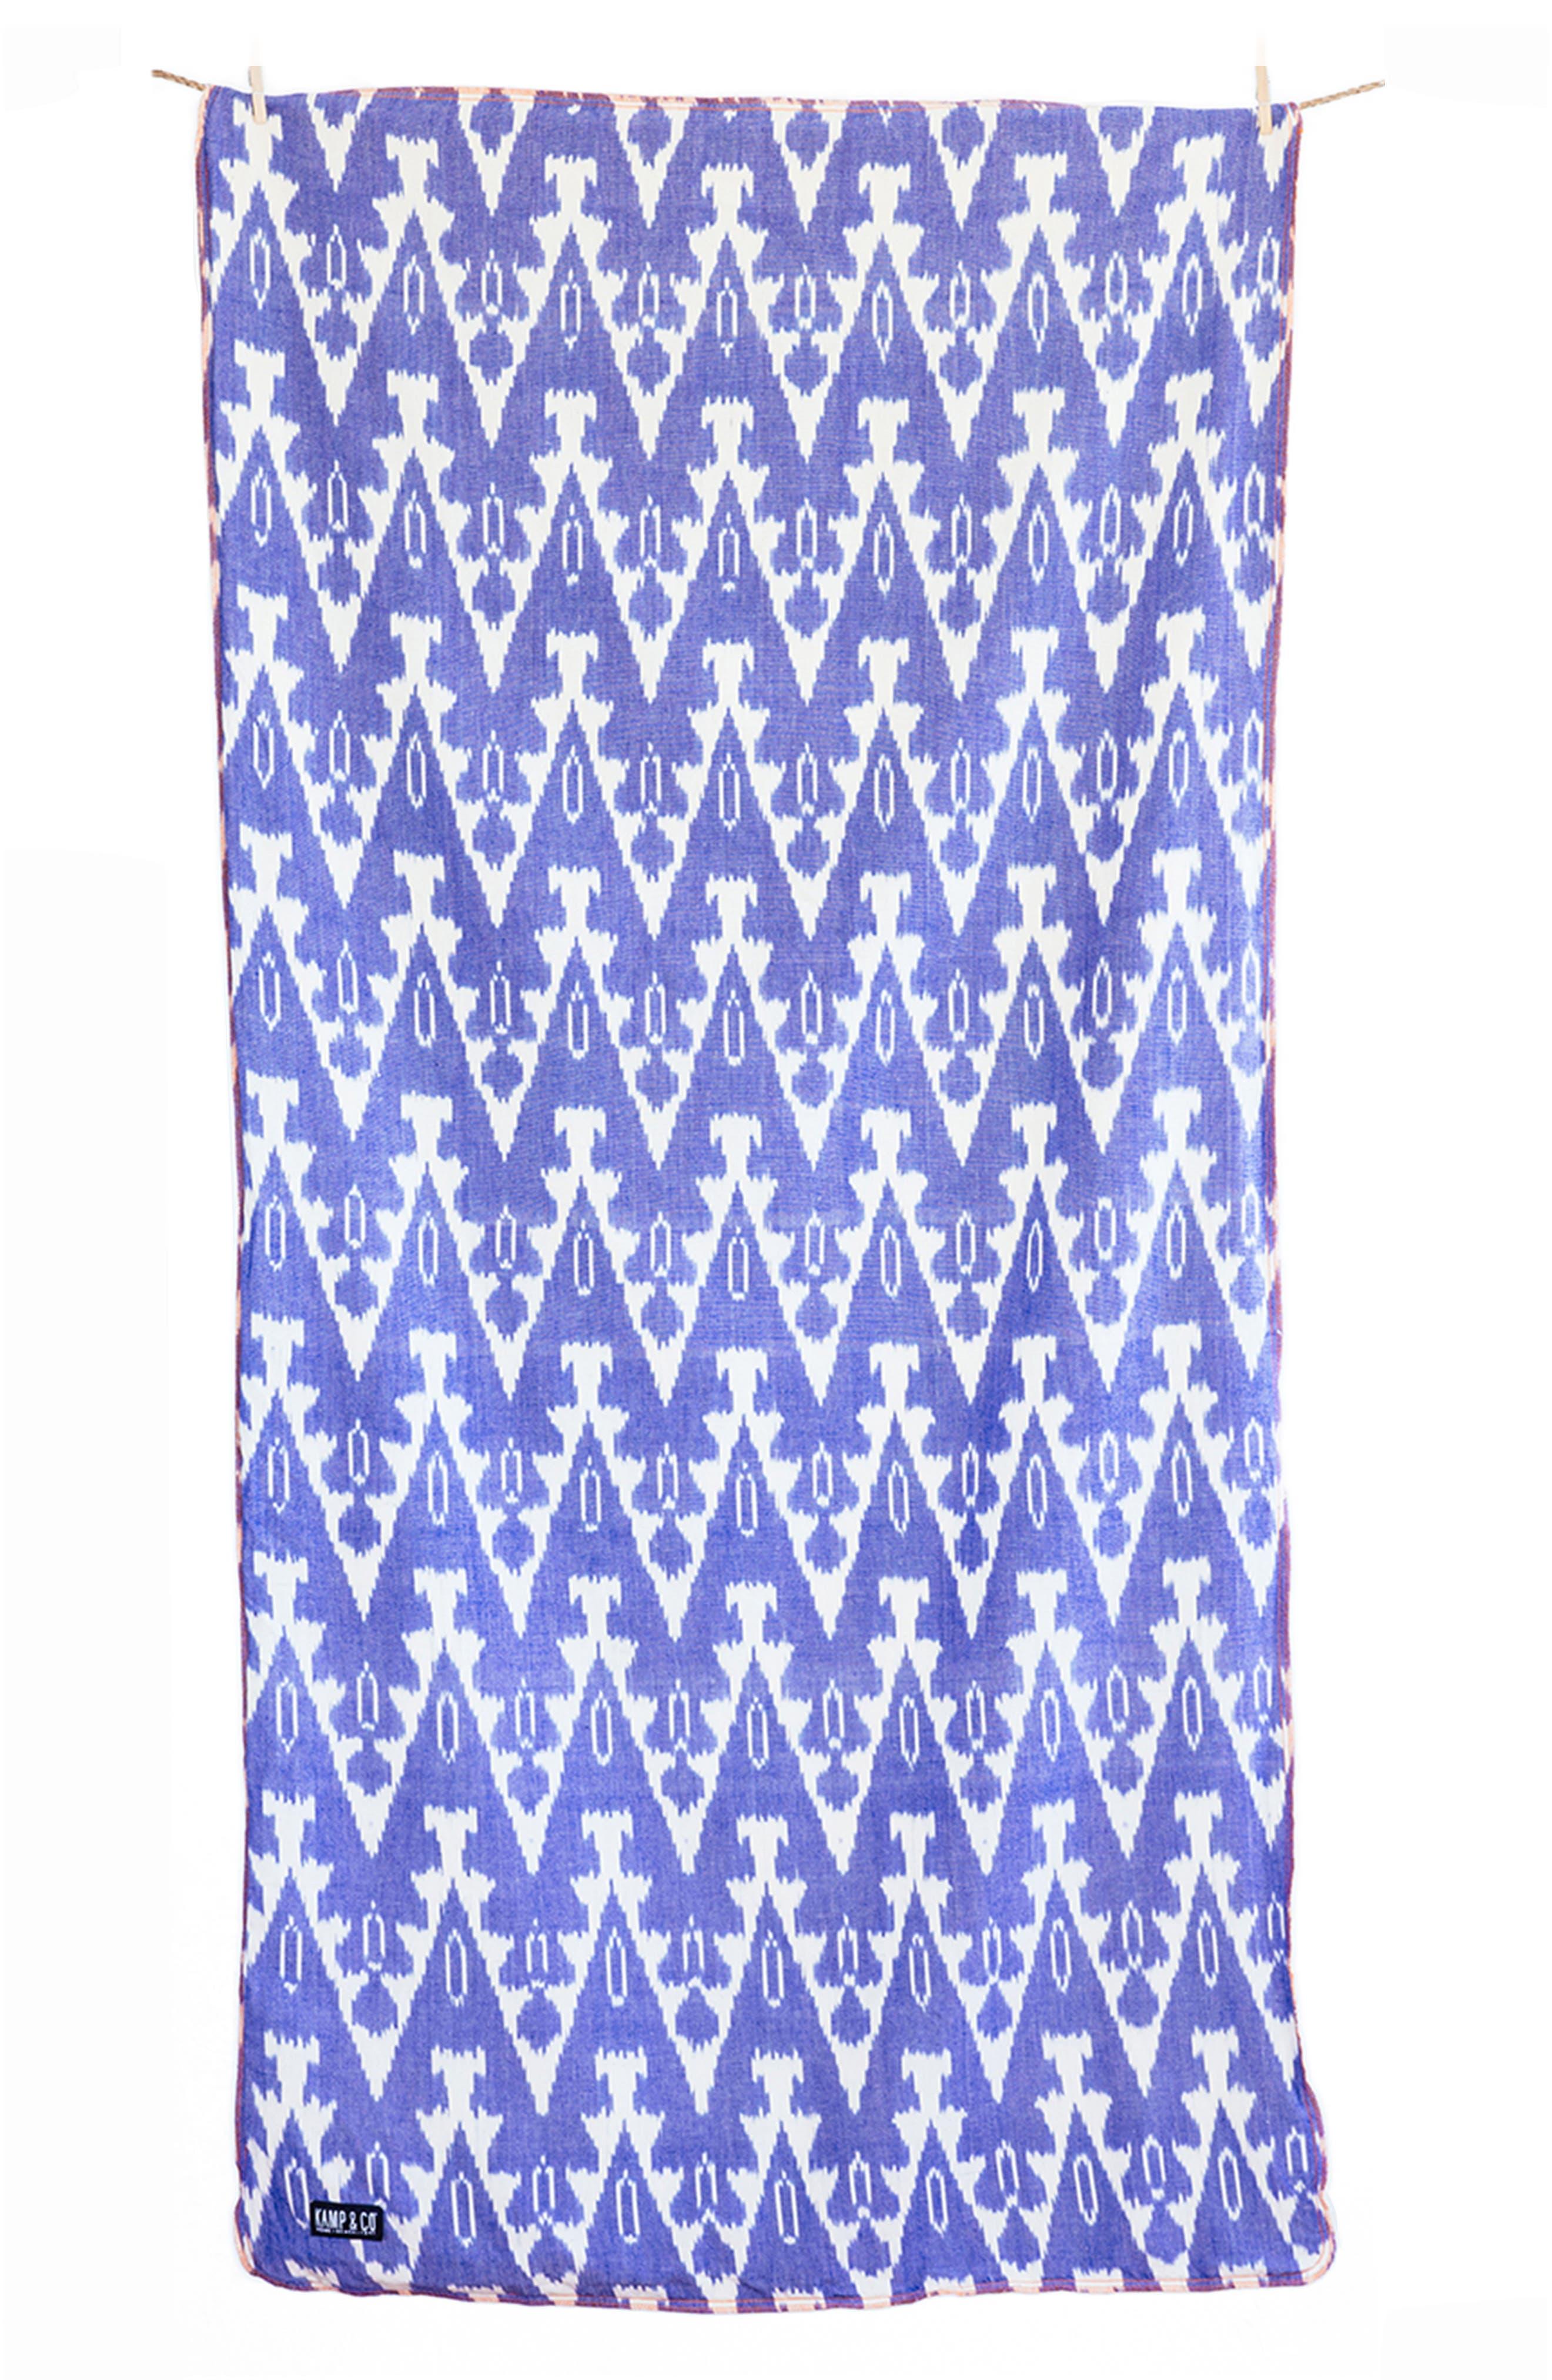 Kamp & Co. Torrey Kamp Towel